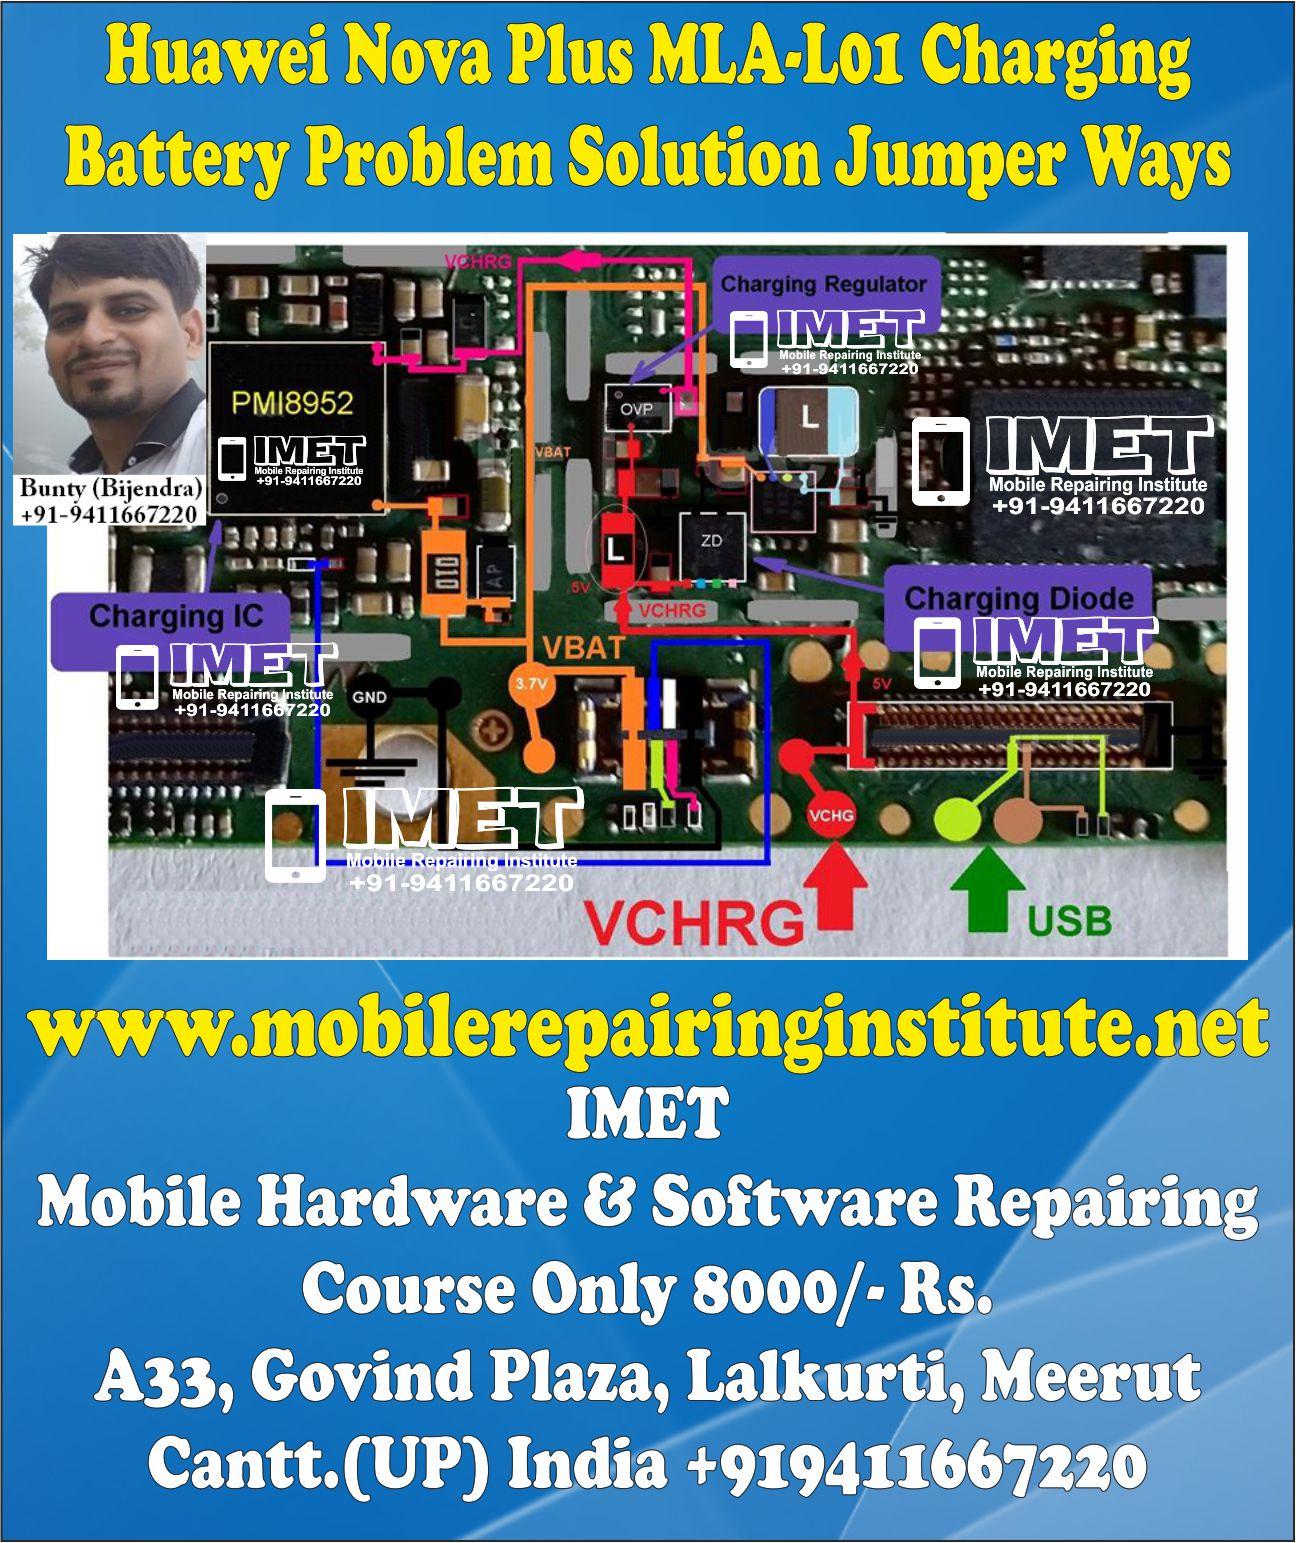 Huawei Nova Plus MLA-L01 Charging Battery Problem Solution Jumper Ways